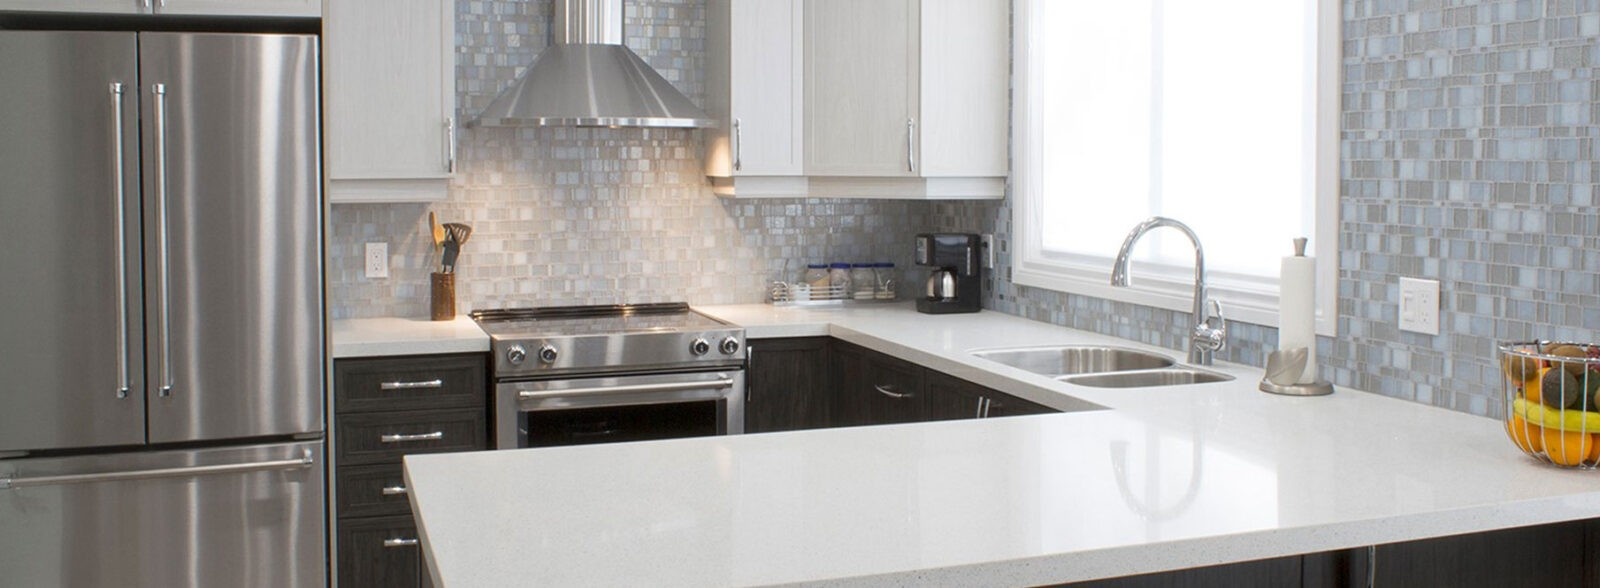 Bathroom Kitchen Remodeling Indianapolis Granite Transformations